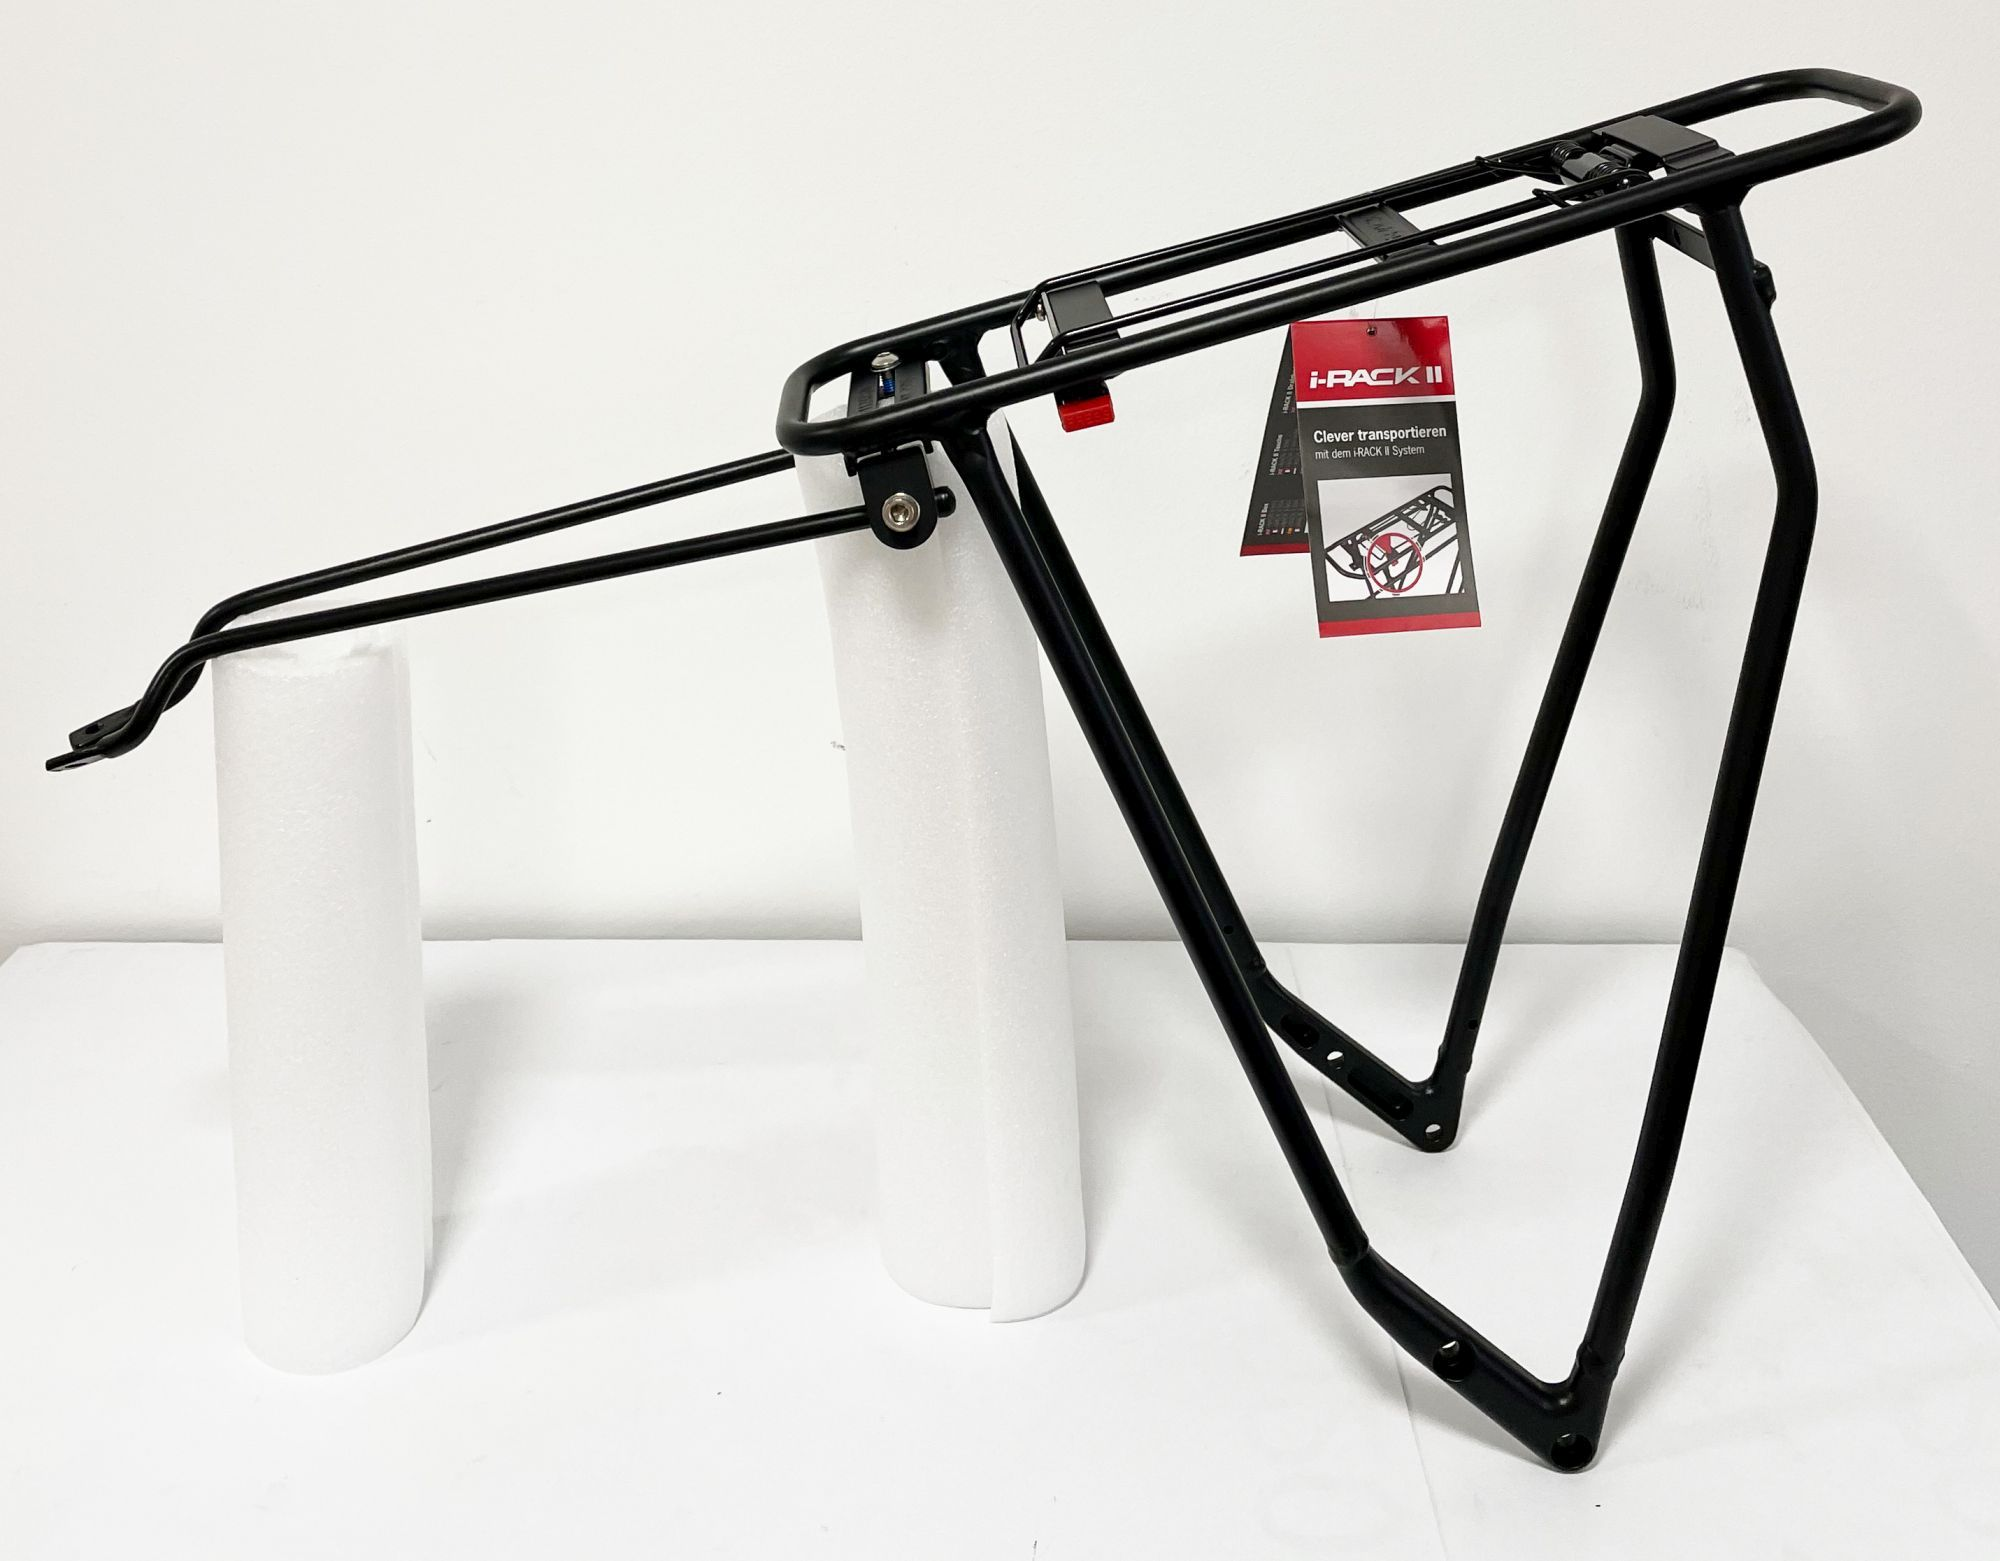 Fahrradteile/Gepäckträger: Standwell  Gepäckträger SW-KM070S 28